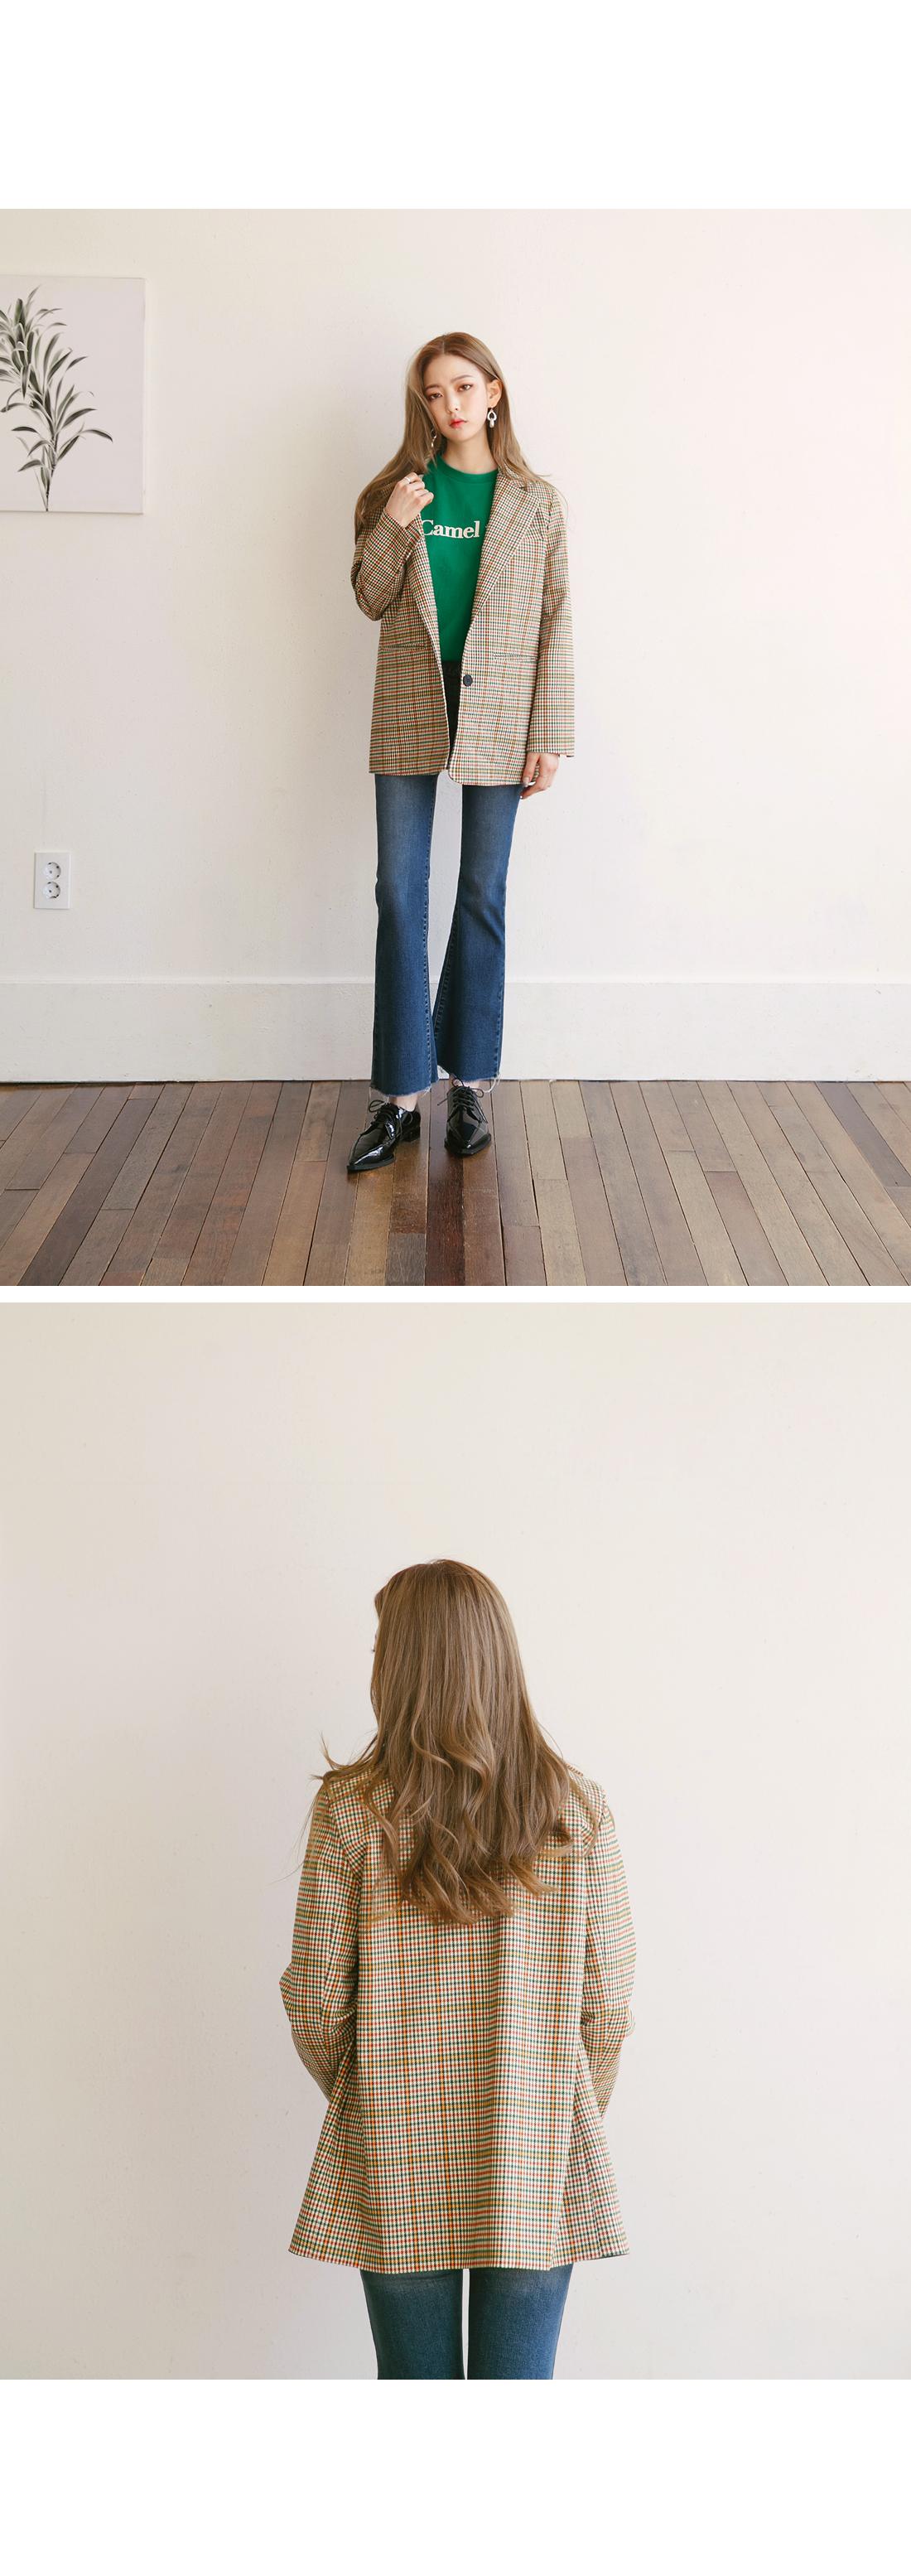 4 BUTTON SEMI BOOTS PANTS